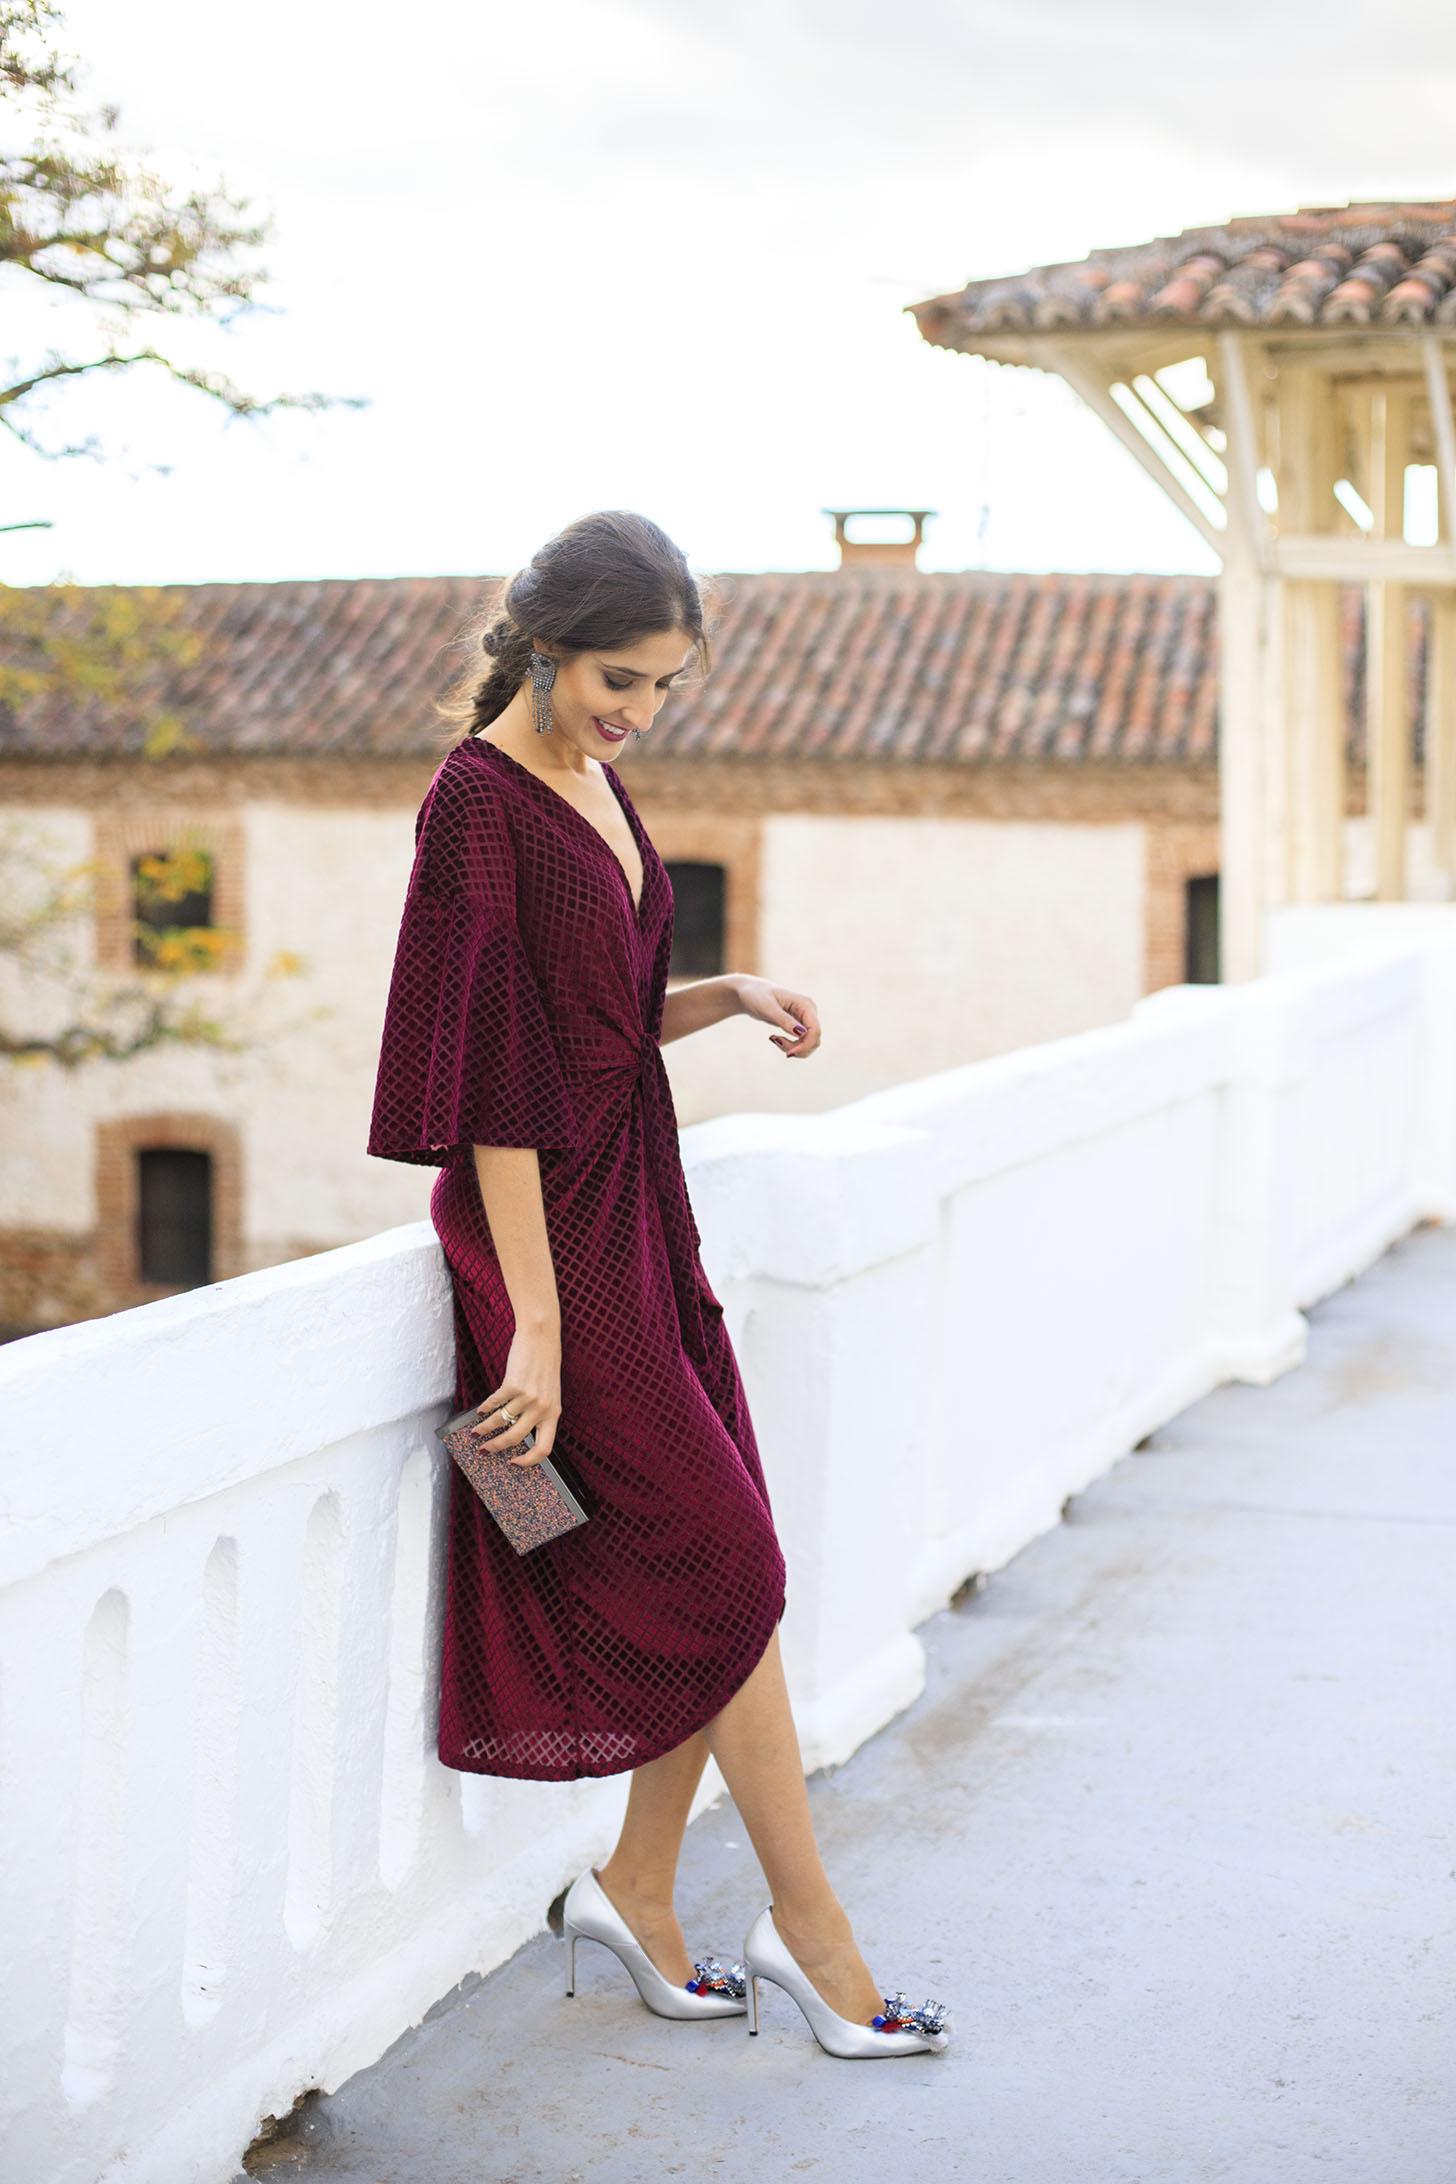 26 Invitada Plata De Zapatos – Zara Con Irreverente Vestido xn8OAwqUYY